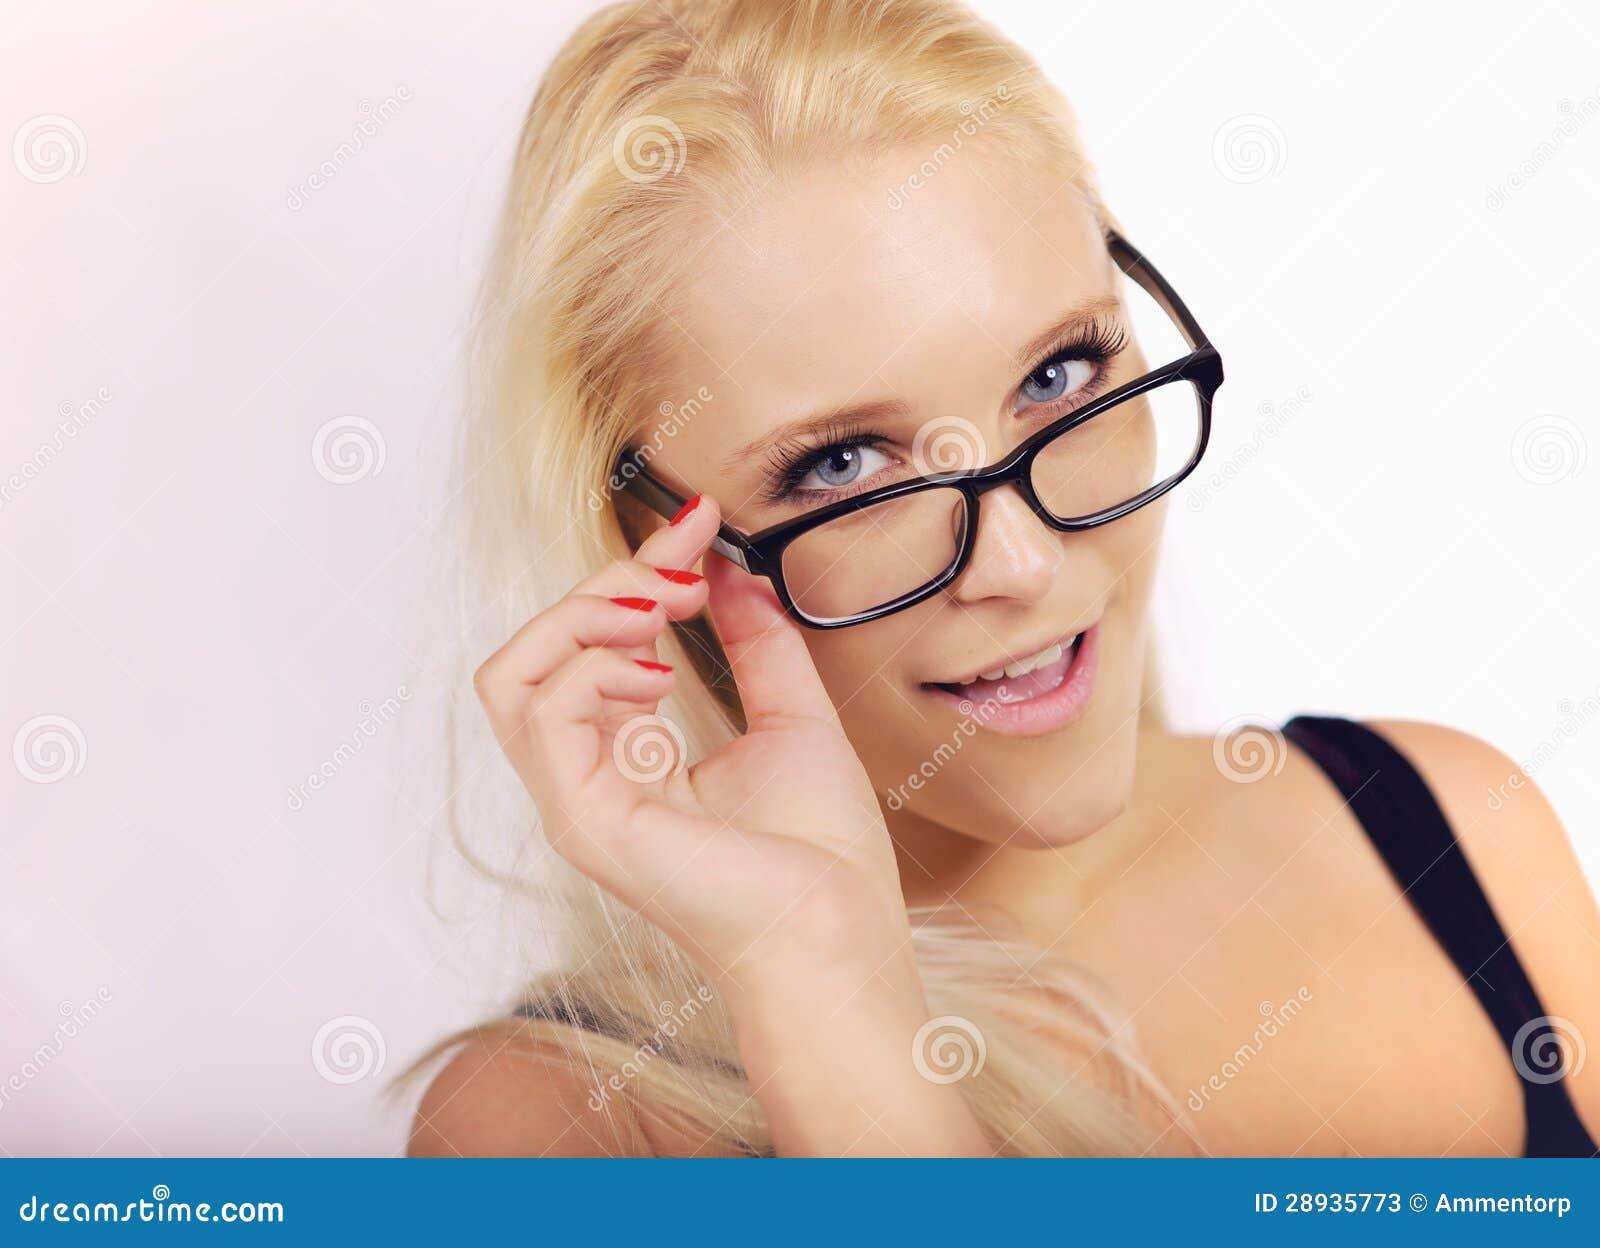 Menina bonita que olha muito esperta em seu Eyewear